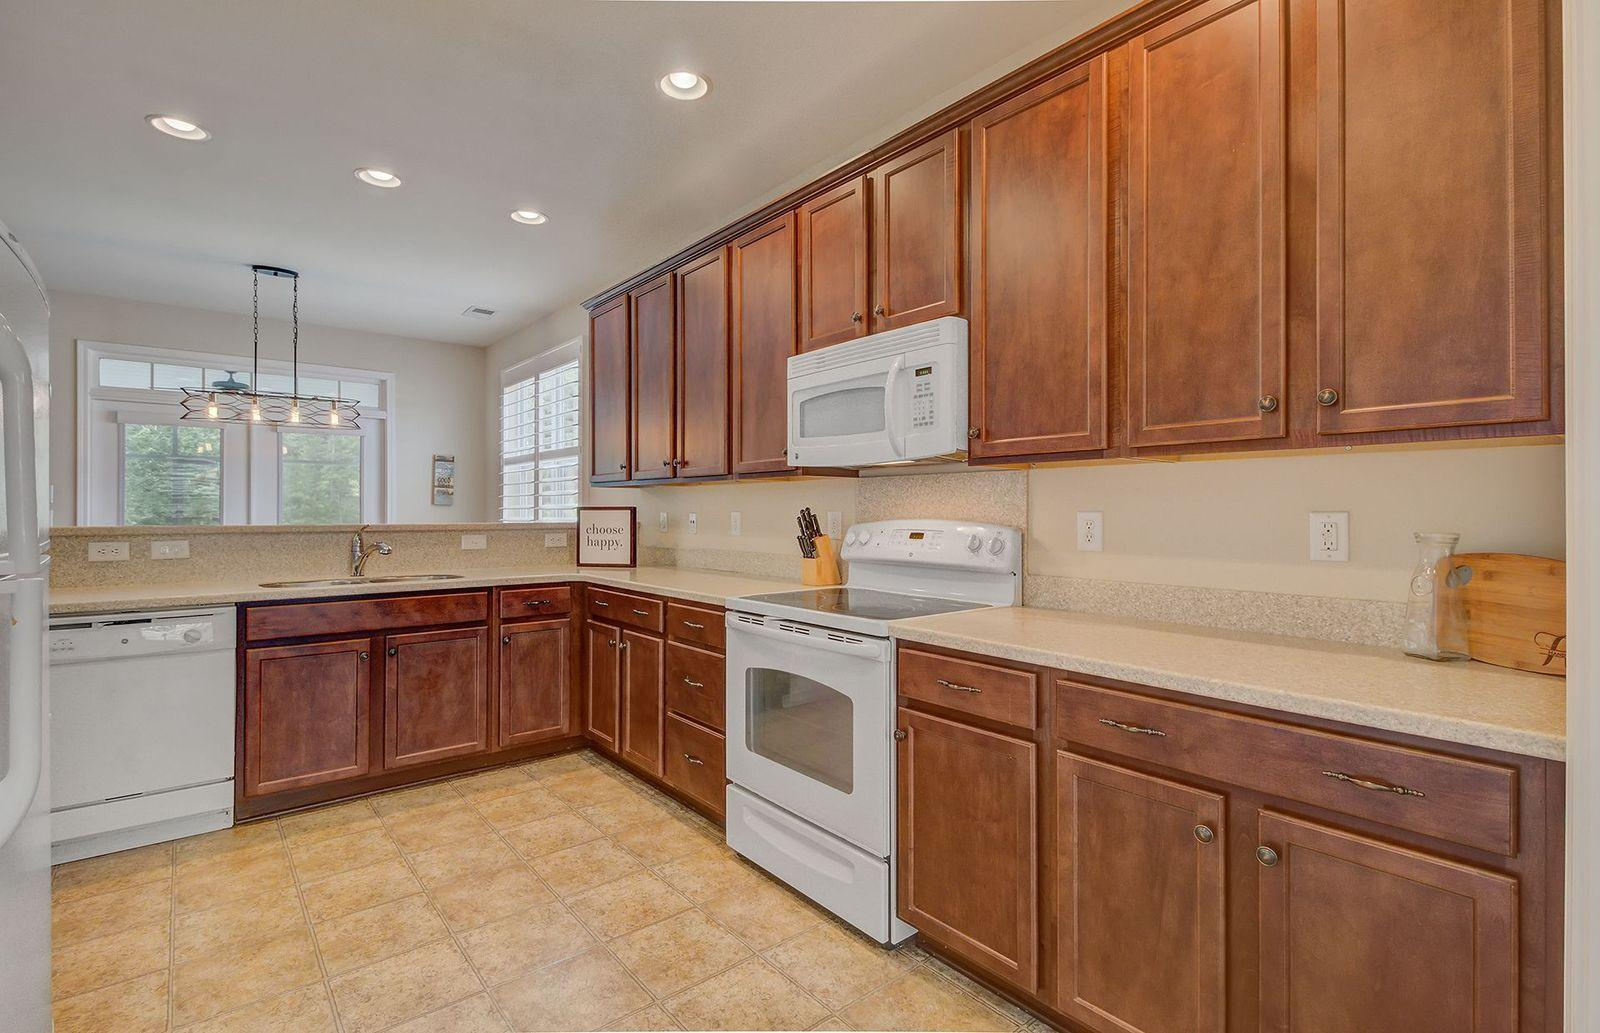 Linnen Place Homes For Sale - 1275 Shingleback, Mount Pleasant, SC - 2